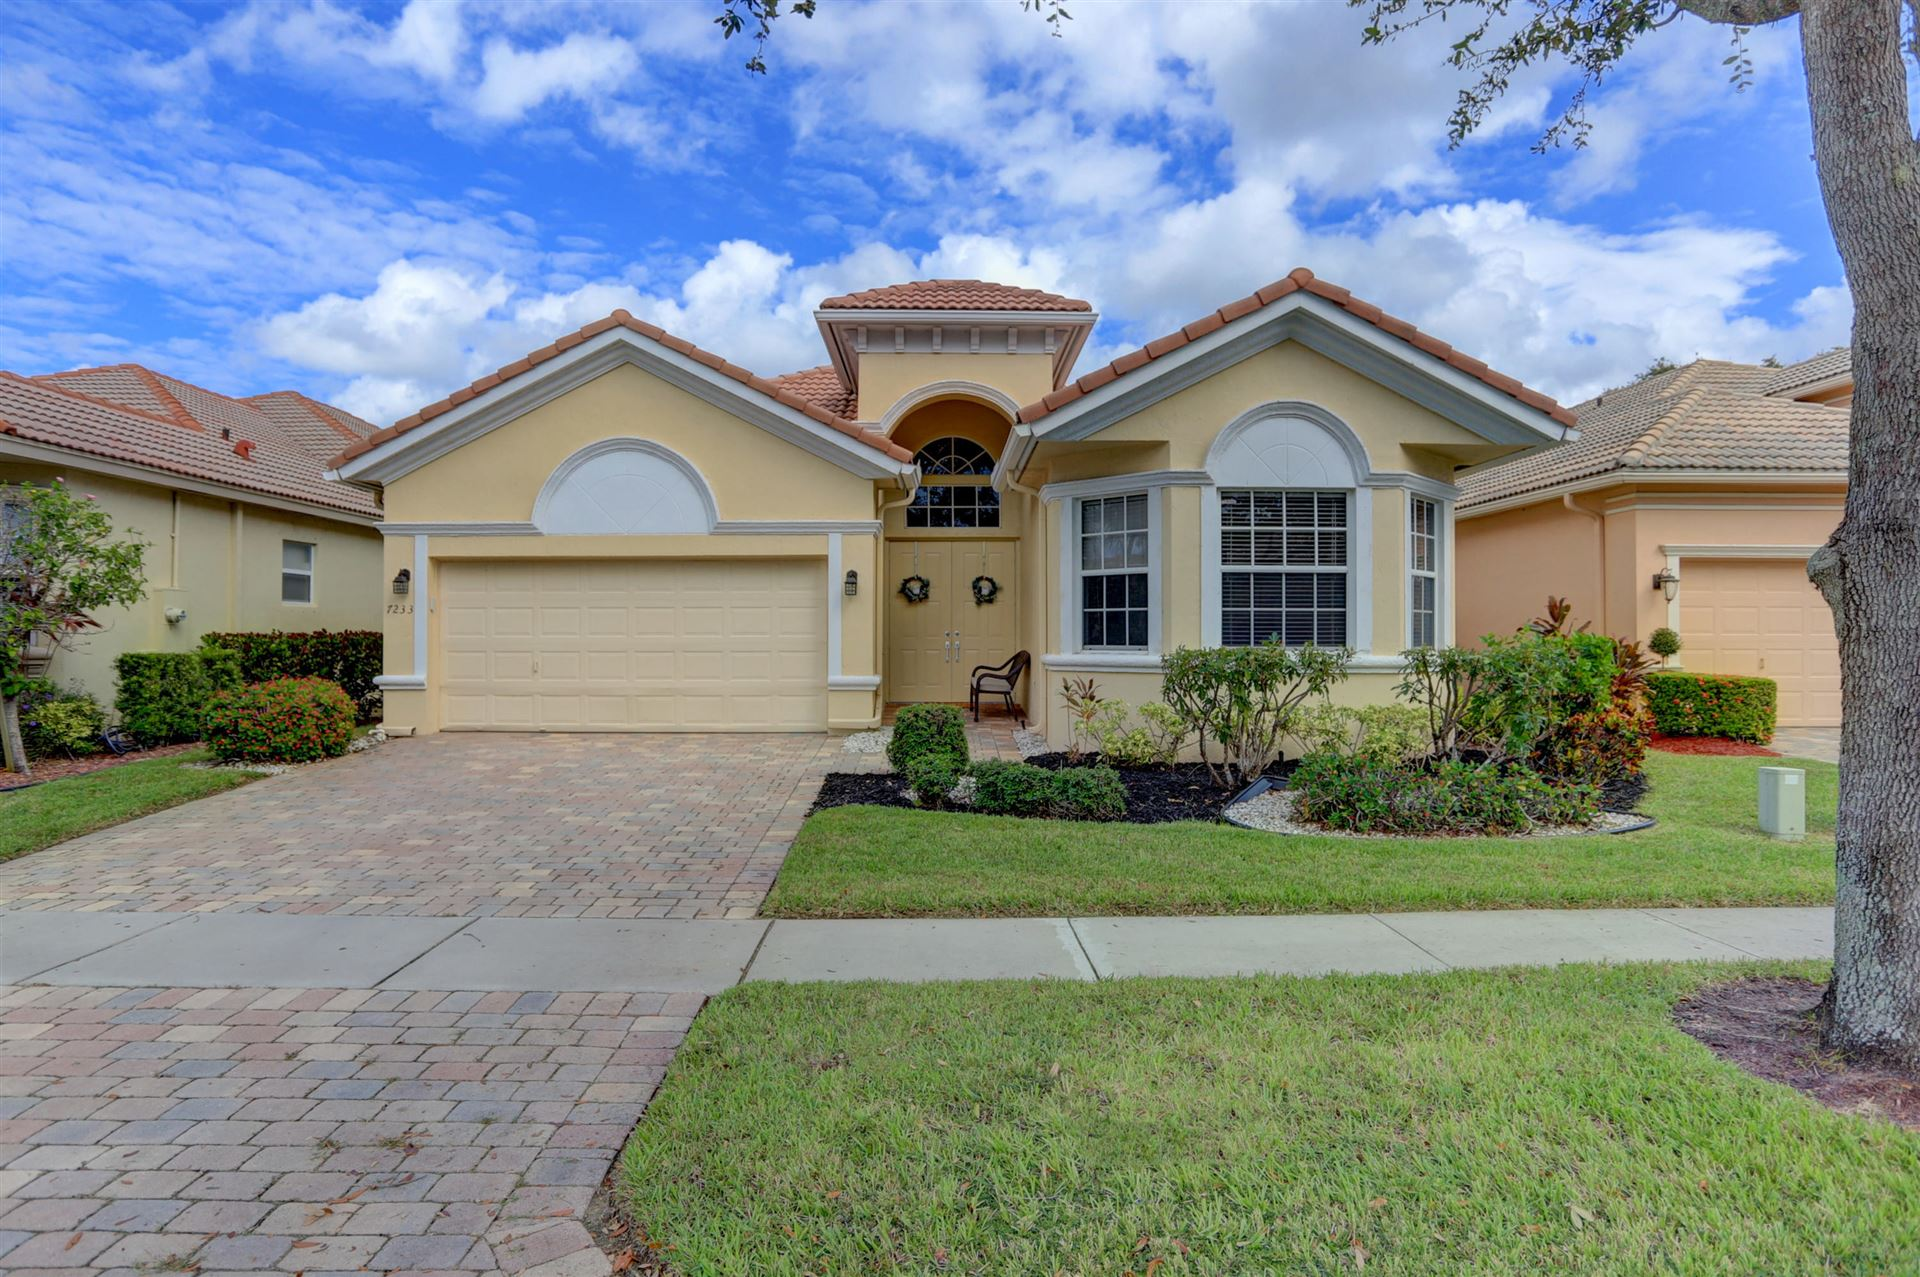 7233 Vesuvio Place, Boynton Beach, FL 33437 - #: RX-10663918